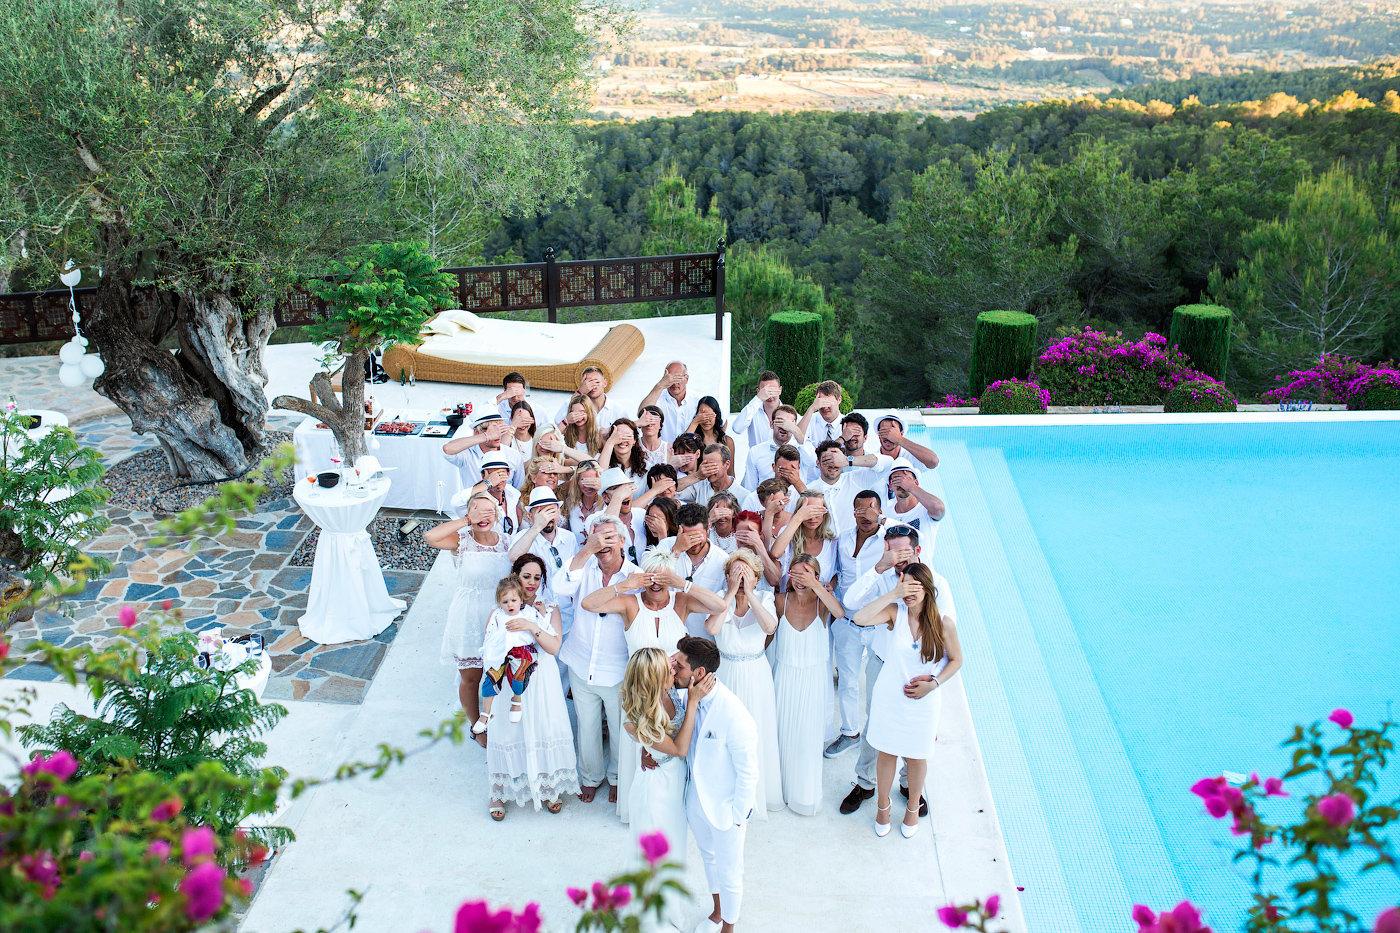 Christina_Eduard_Photography_Ibiza_Hochzeit_012